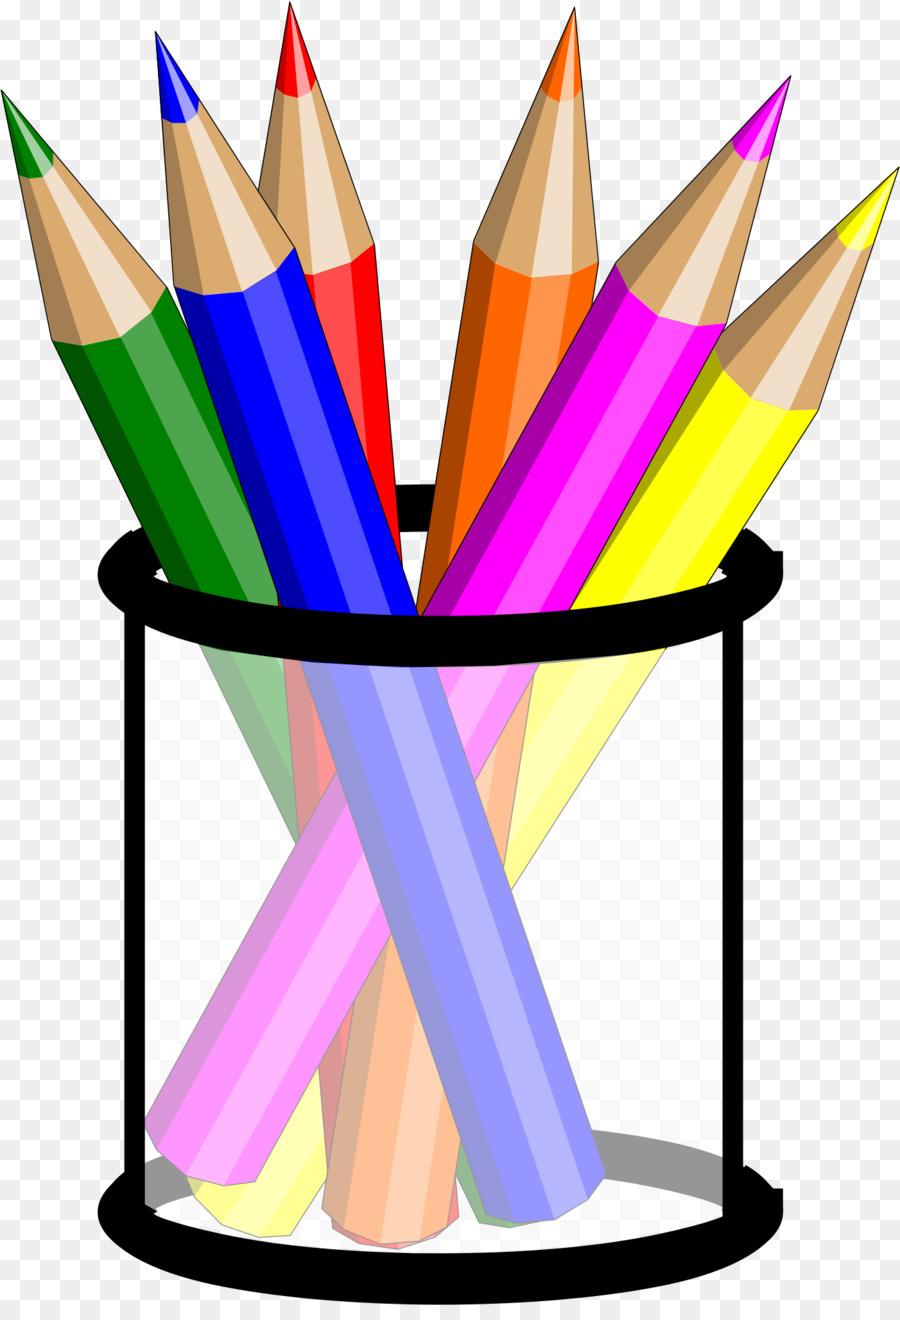 900x1320 Colored Pencil Drawing Clip Art